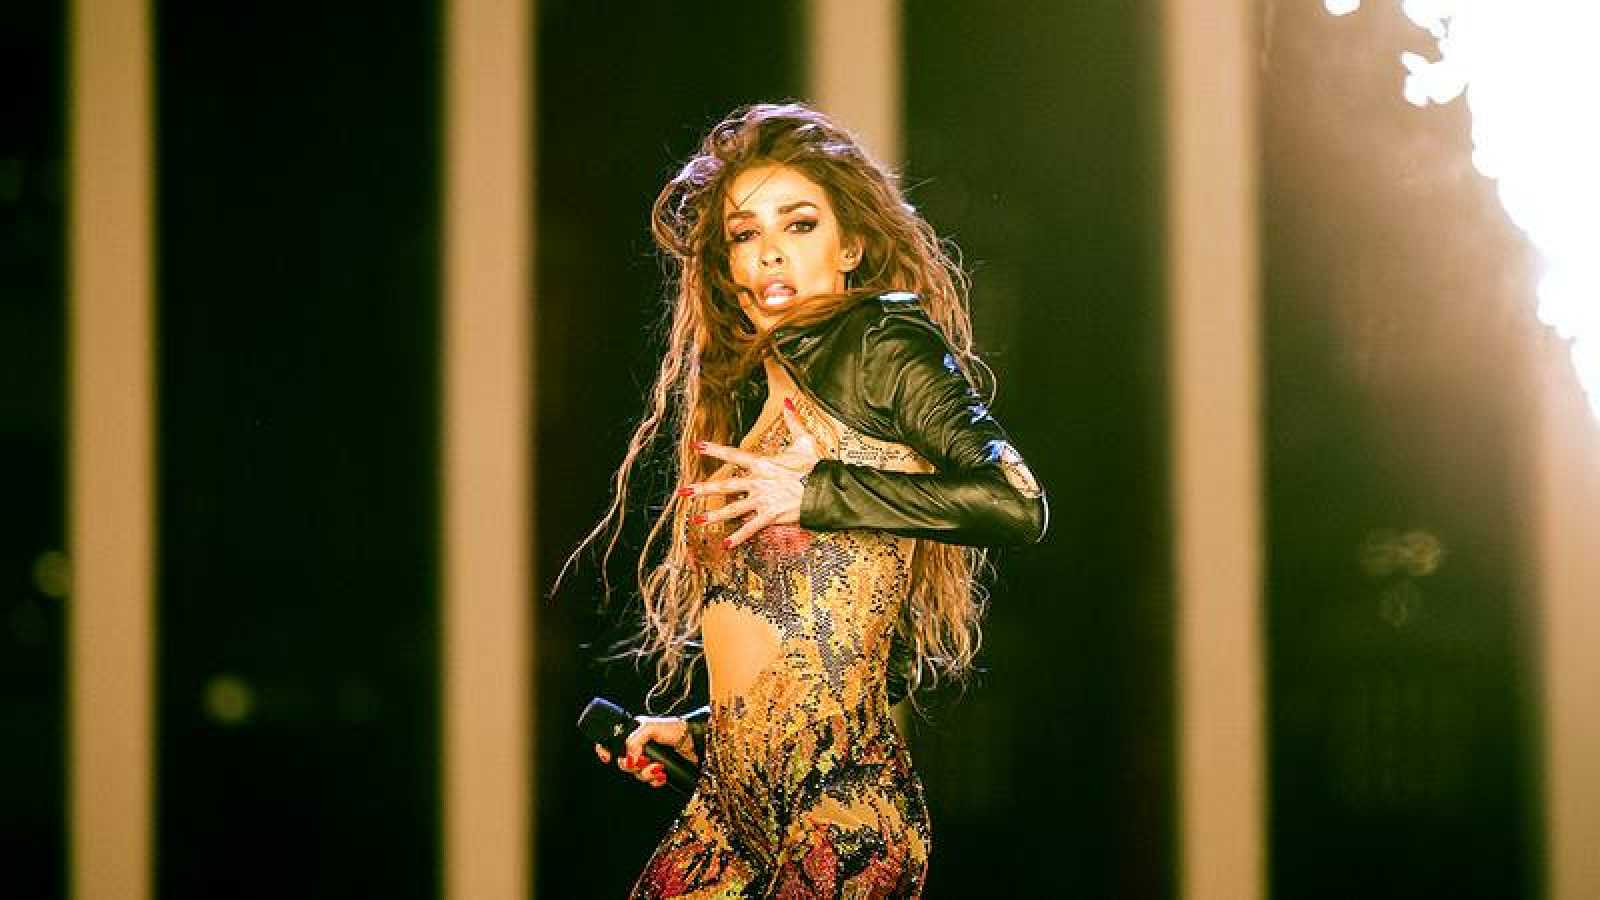 Eleni Foureira, artista invitada en la gala OT Eurovisión del 20 de enero